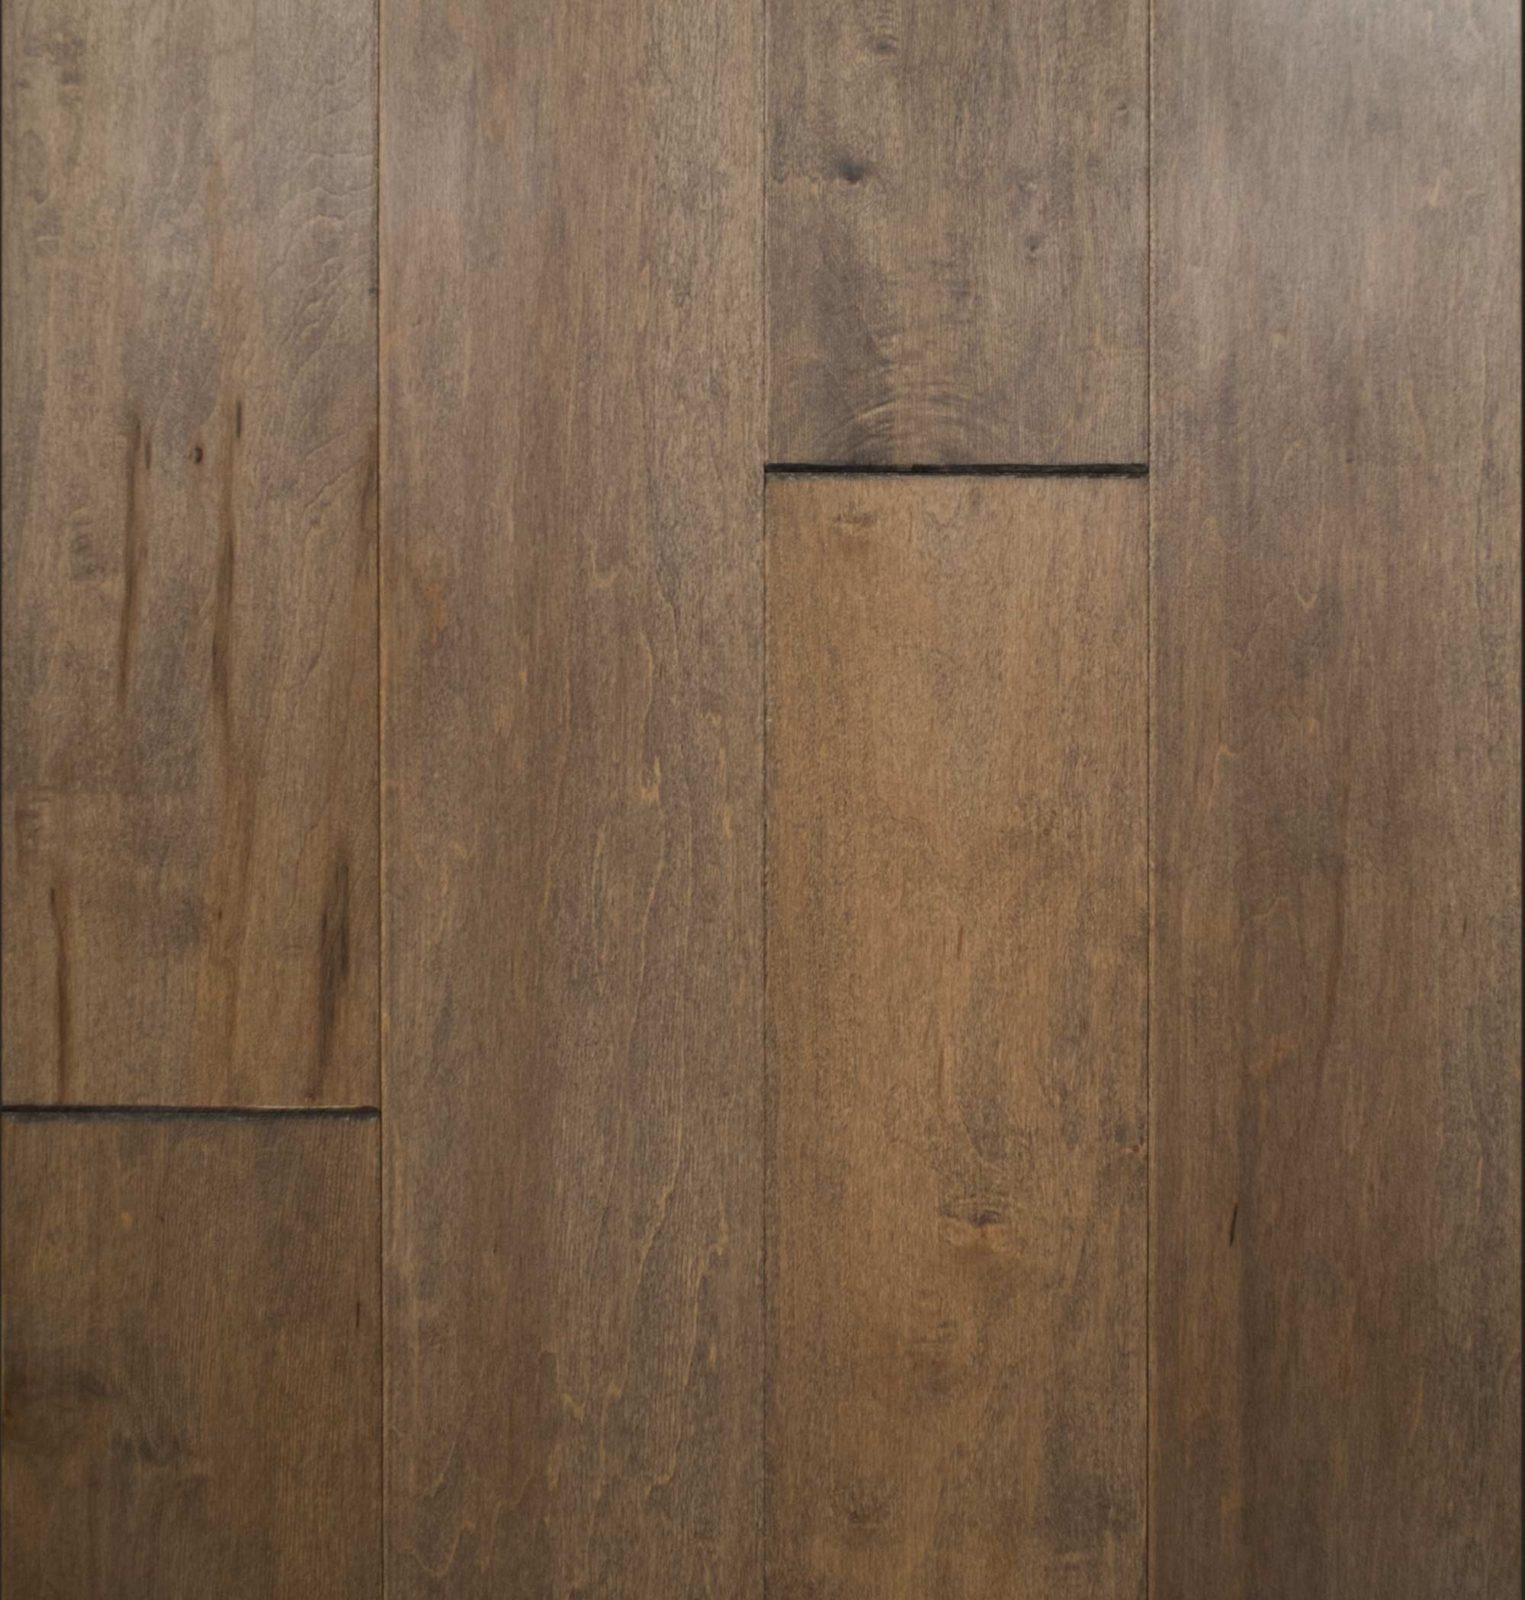 Mohawk wood flooring gary voisin flooring portfolio for Mohawk flooring reviews